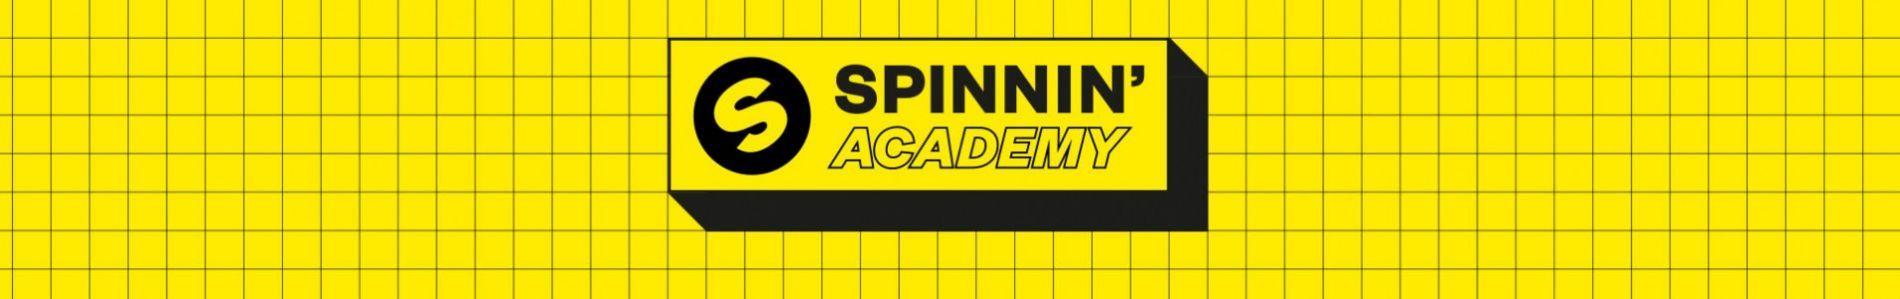 Spinnin' Sessions Club Spinnin' Presents: Spinnin' Academy